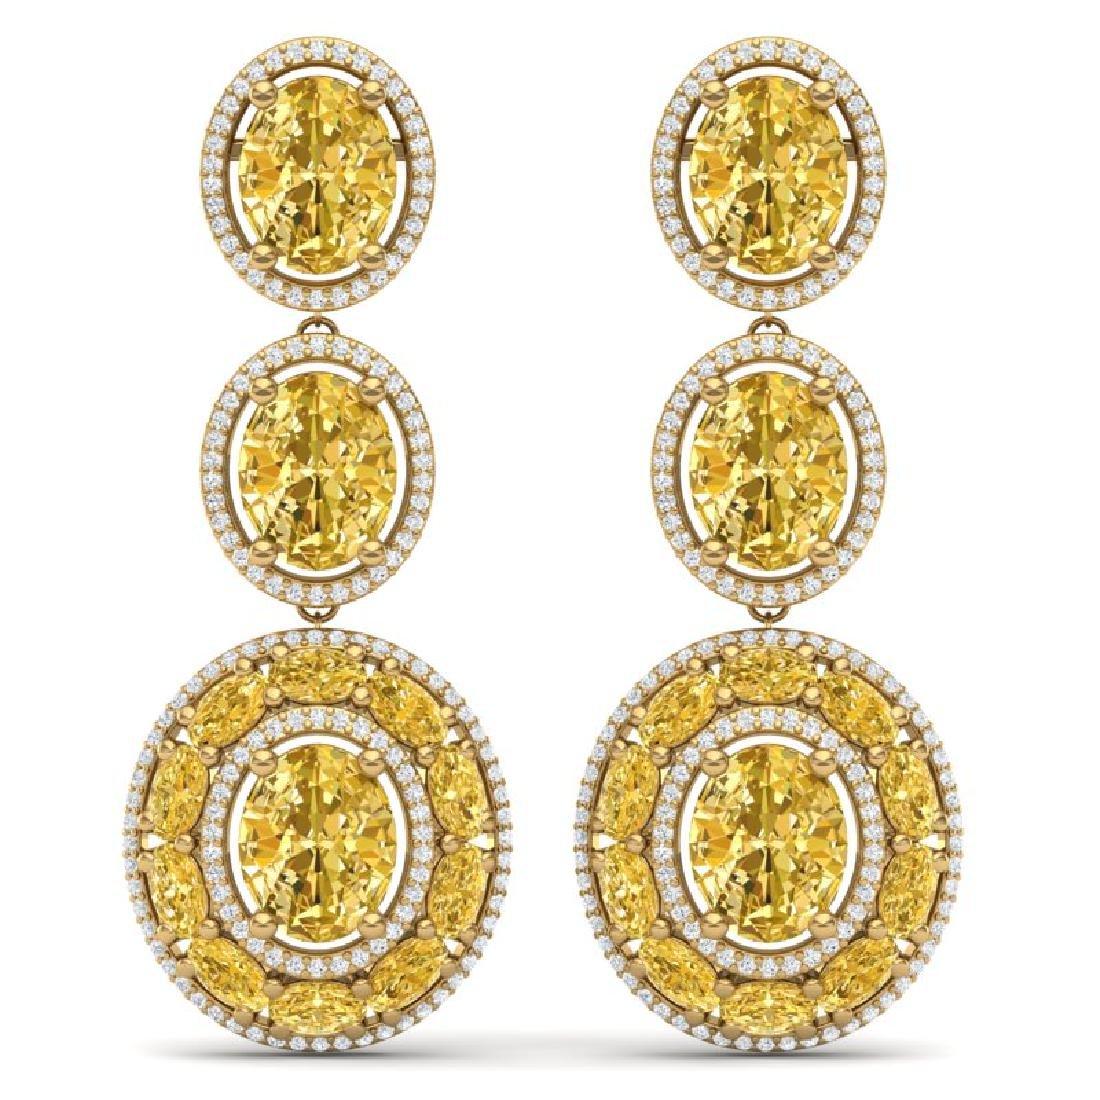 29.71 CTW Royalty Canary Citrine & VS Diamond Earrings